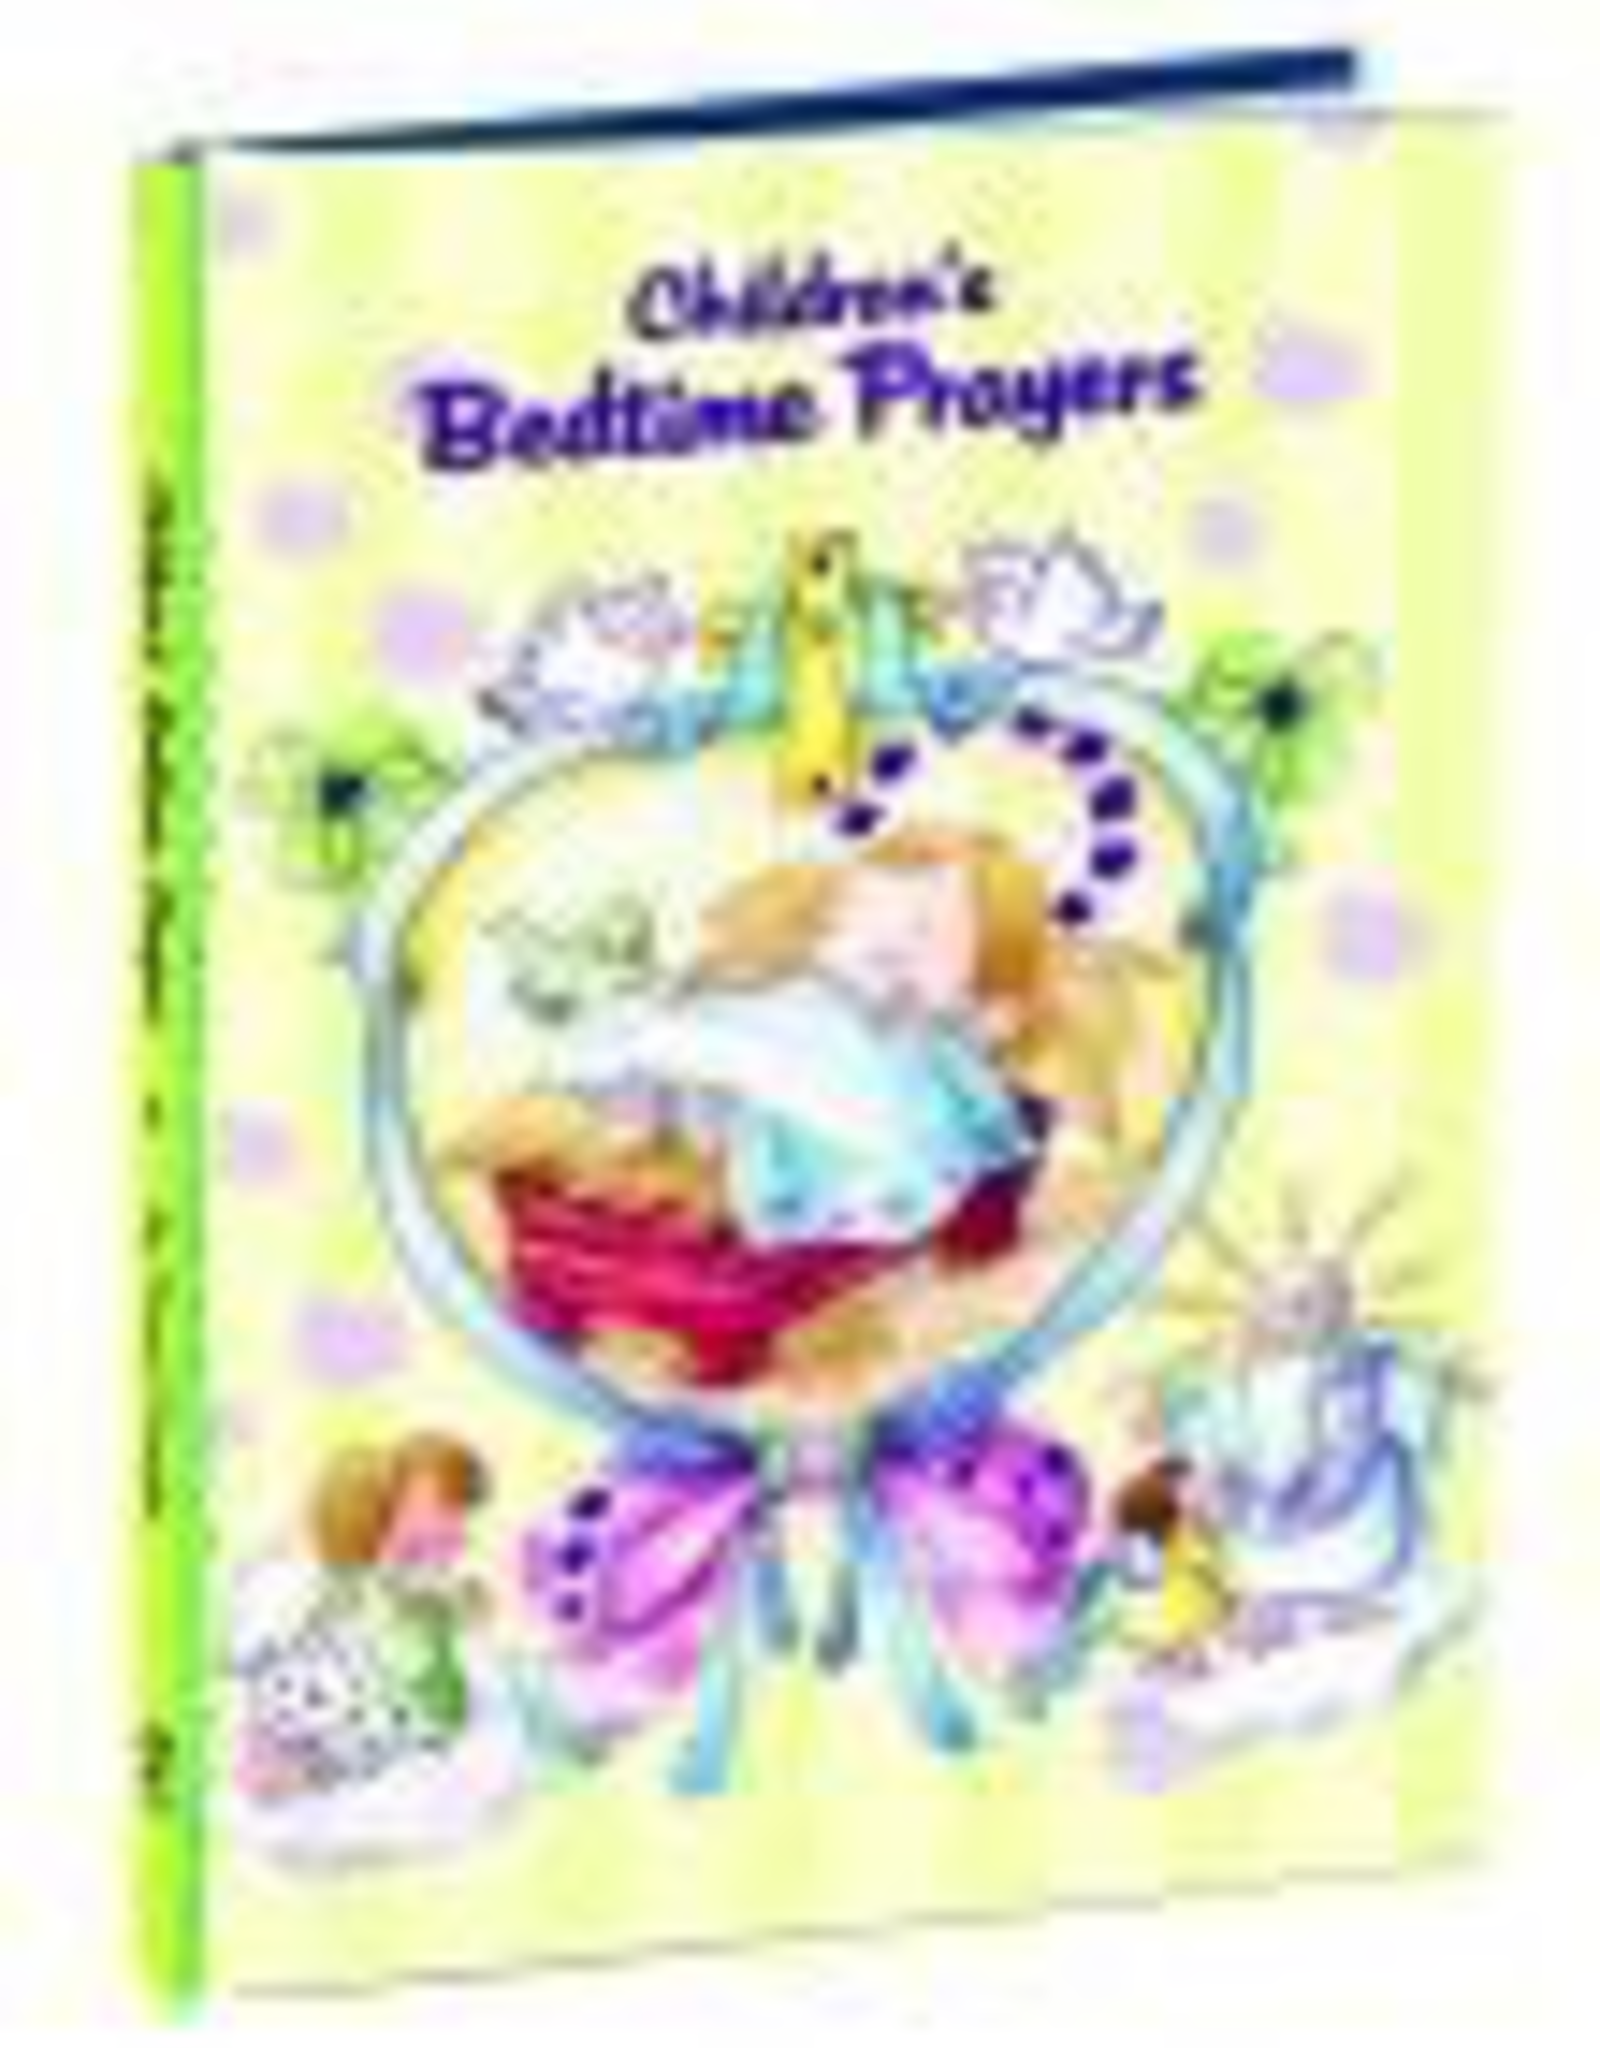 Catholic Book Publishing Children's Bedtime Prayers, by Thomas Donaghy (padded hardcover)